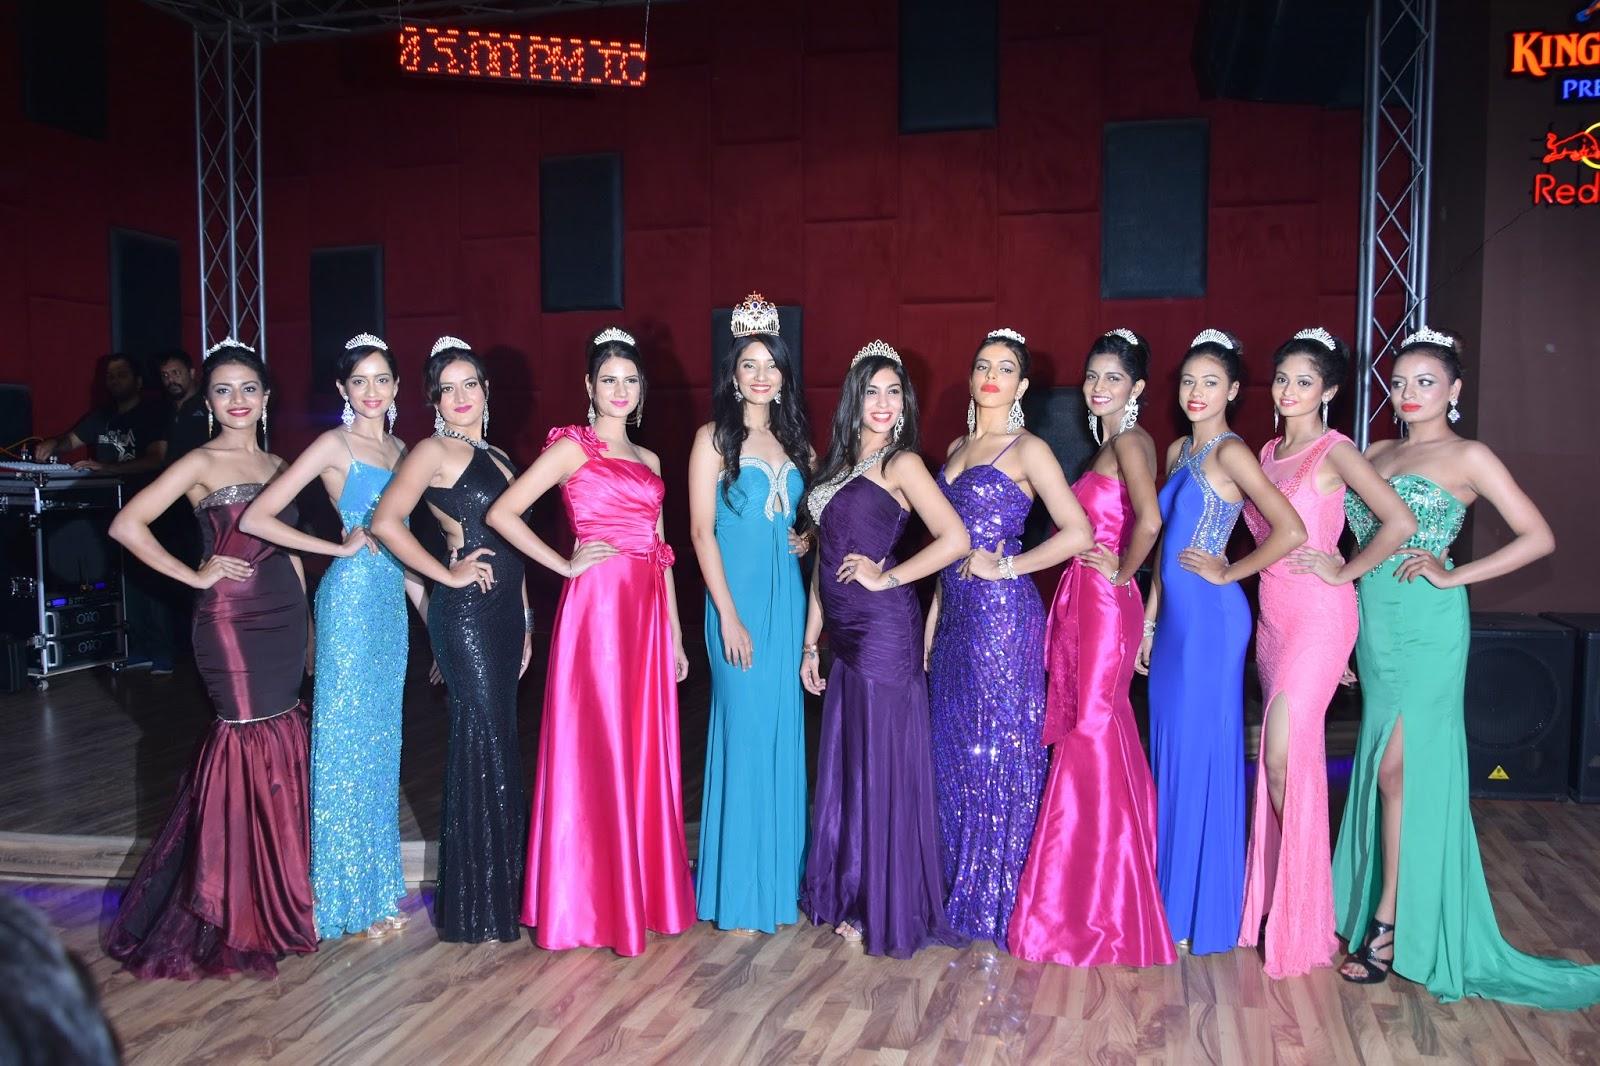 ... Kingfisher Calendar Girls 2016/2017, Exquisite India Pageants 2016